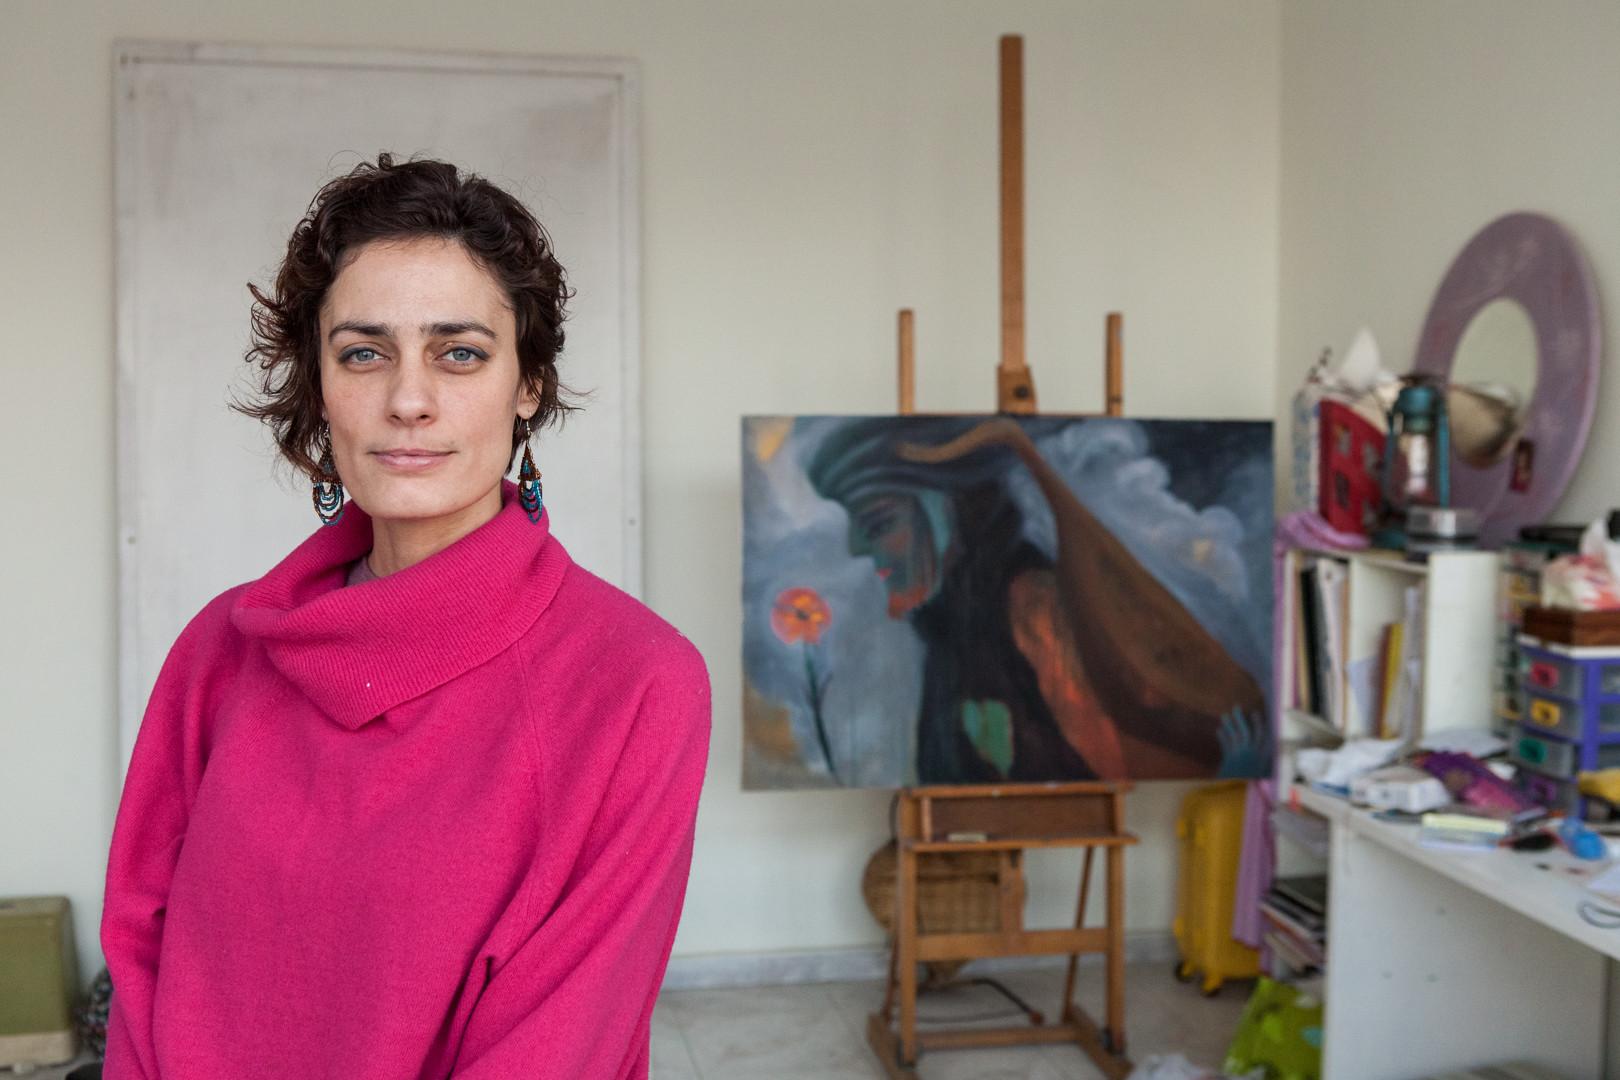 Amélie Losier.  May El Hossamy, 36 Jahre Kairo, Ägypten, 2014